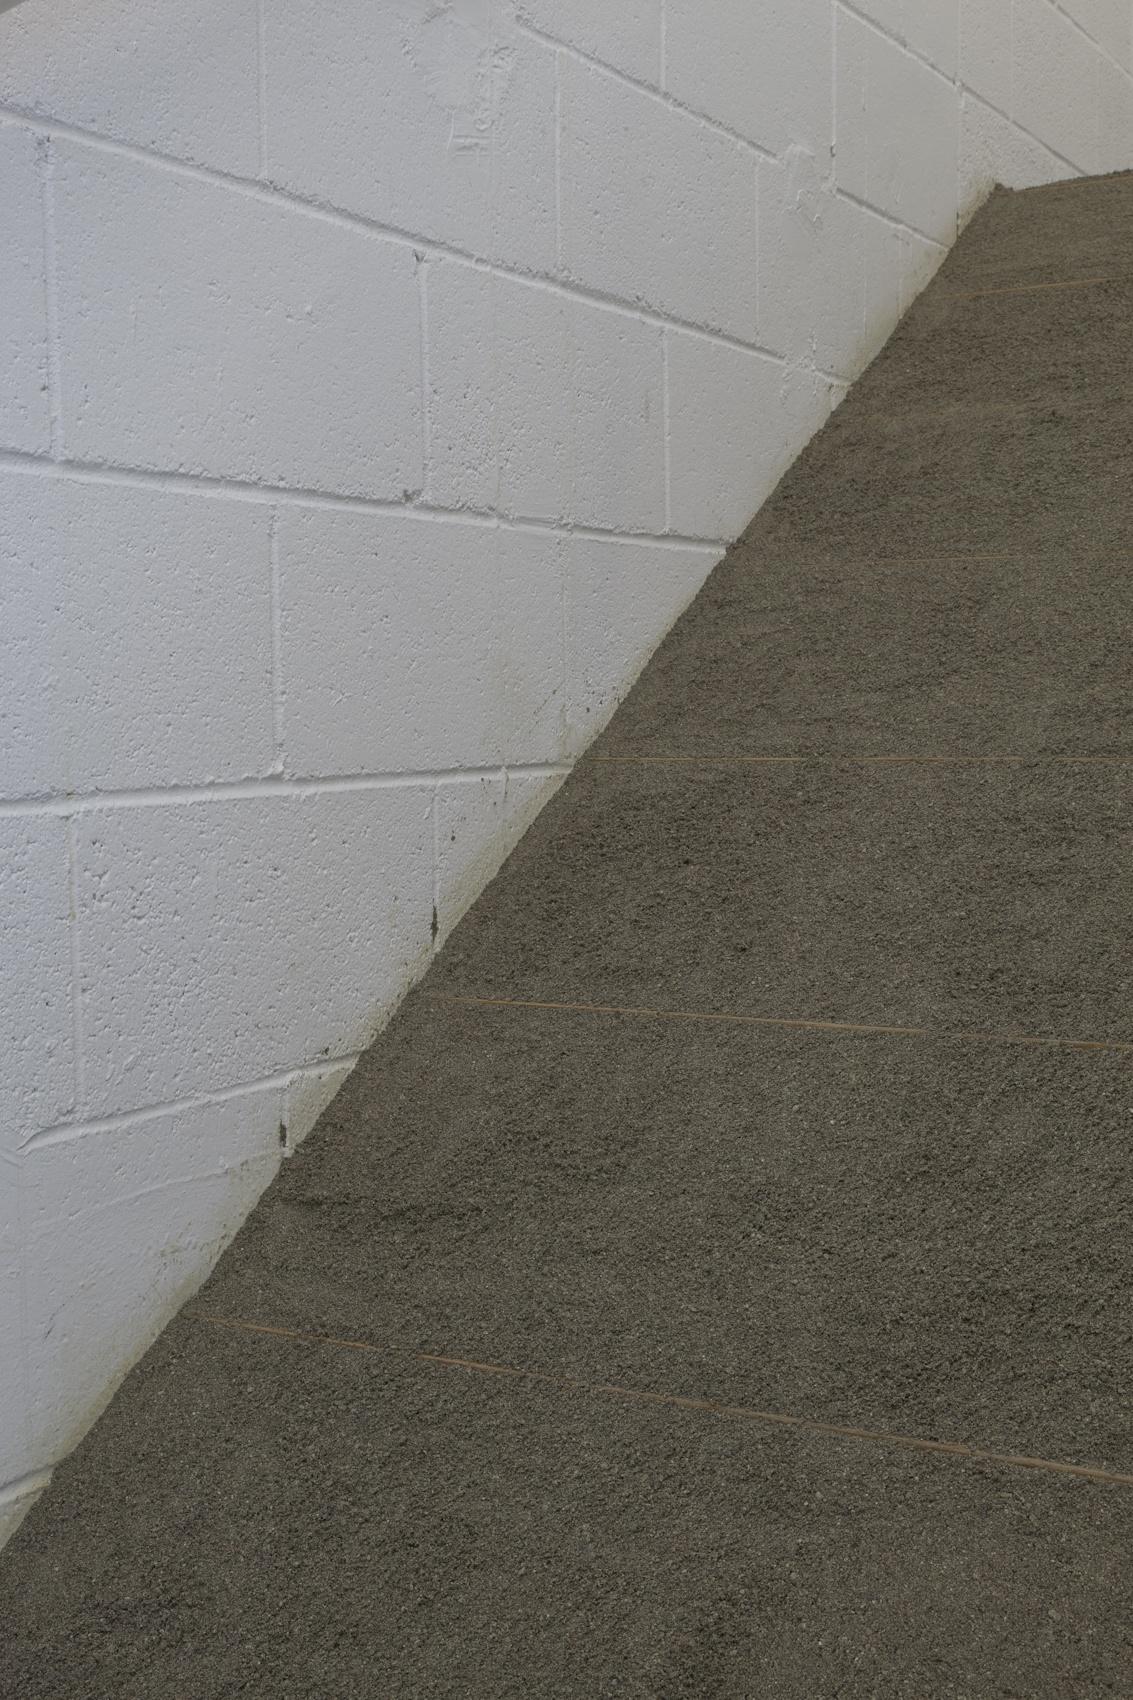 Infinite Situation II (steps) , 1970 無限状況 II (階段)( M  ugen Jōkyō II [Kaidan])  Sand, stairs Dimensions variable Installation view, Requiem for the Sun: The Art of Mono-ha at Blum & Poe, Los Angeles, 2012 Courtesy Blum & Poe, Los Angeles / New York / Tokyo